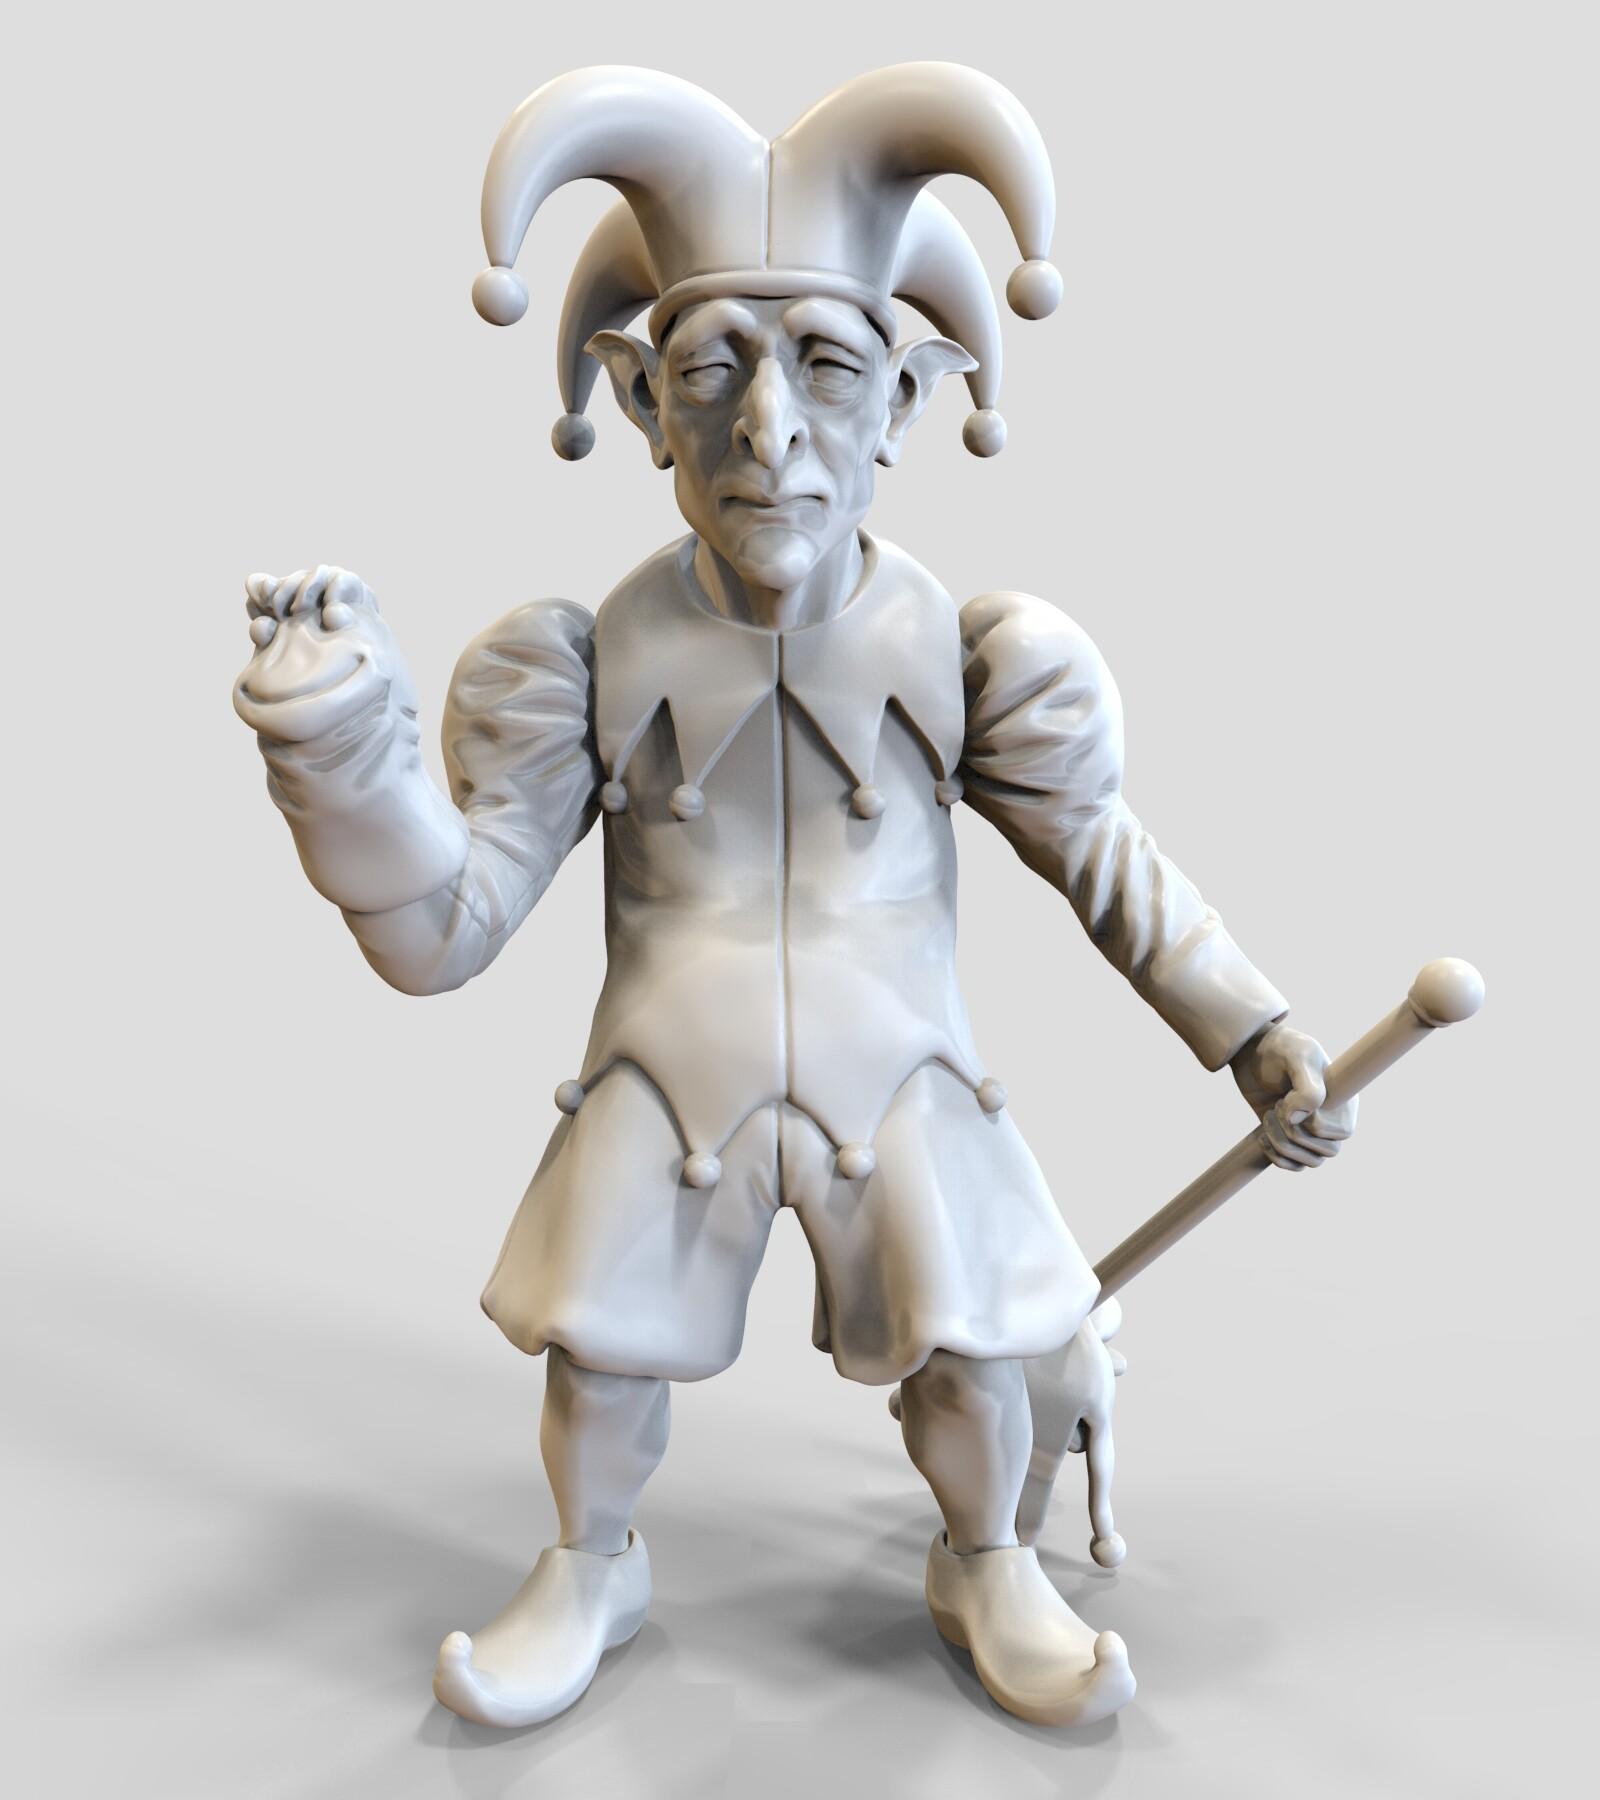 Andre de souza goblin jester 1